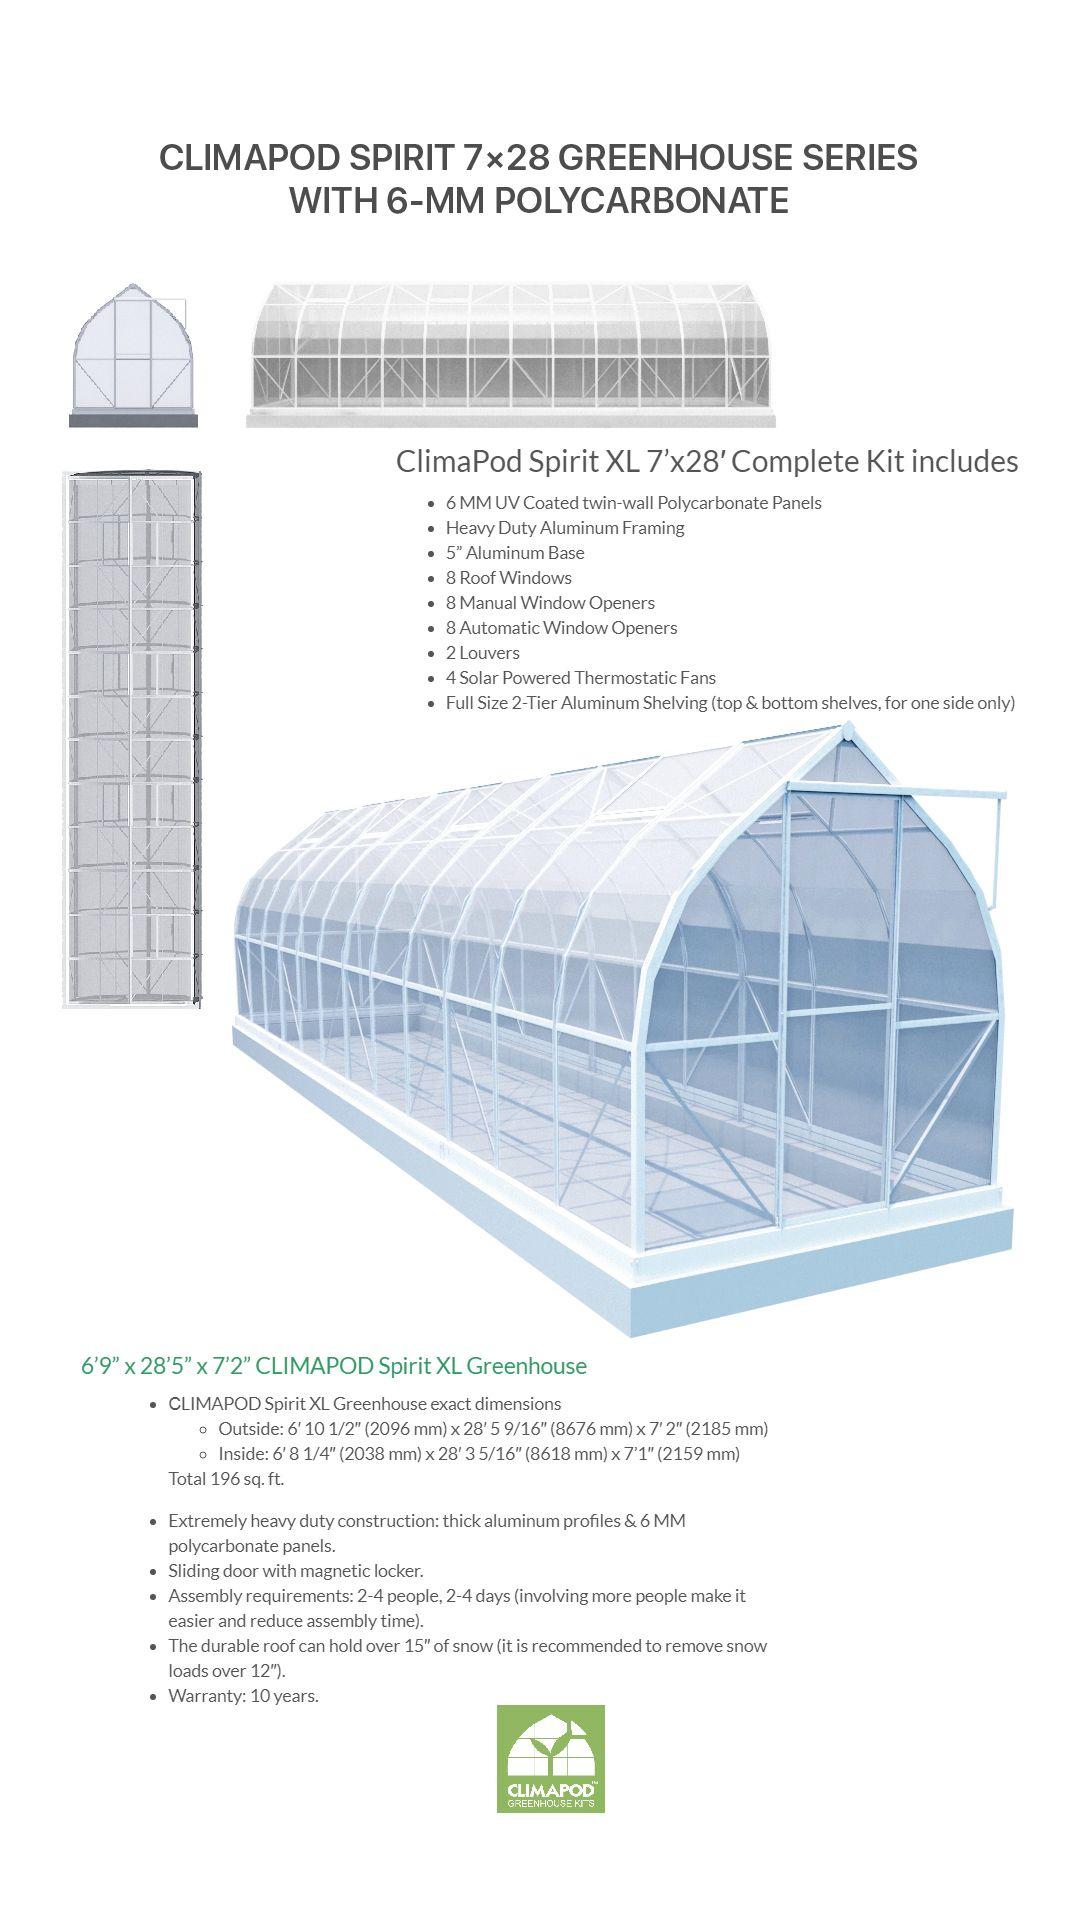 Climapod Spirit Xl 7x28 7x35 7x42 Greenhouse Series With 6 Mm